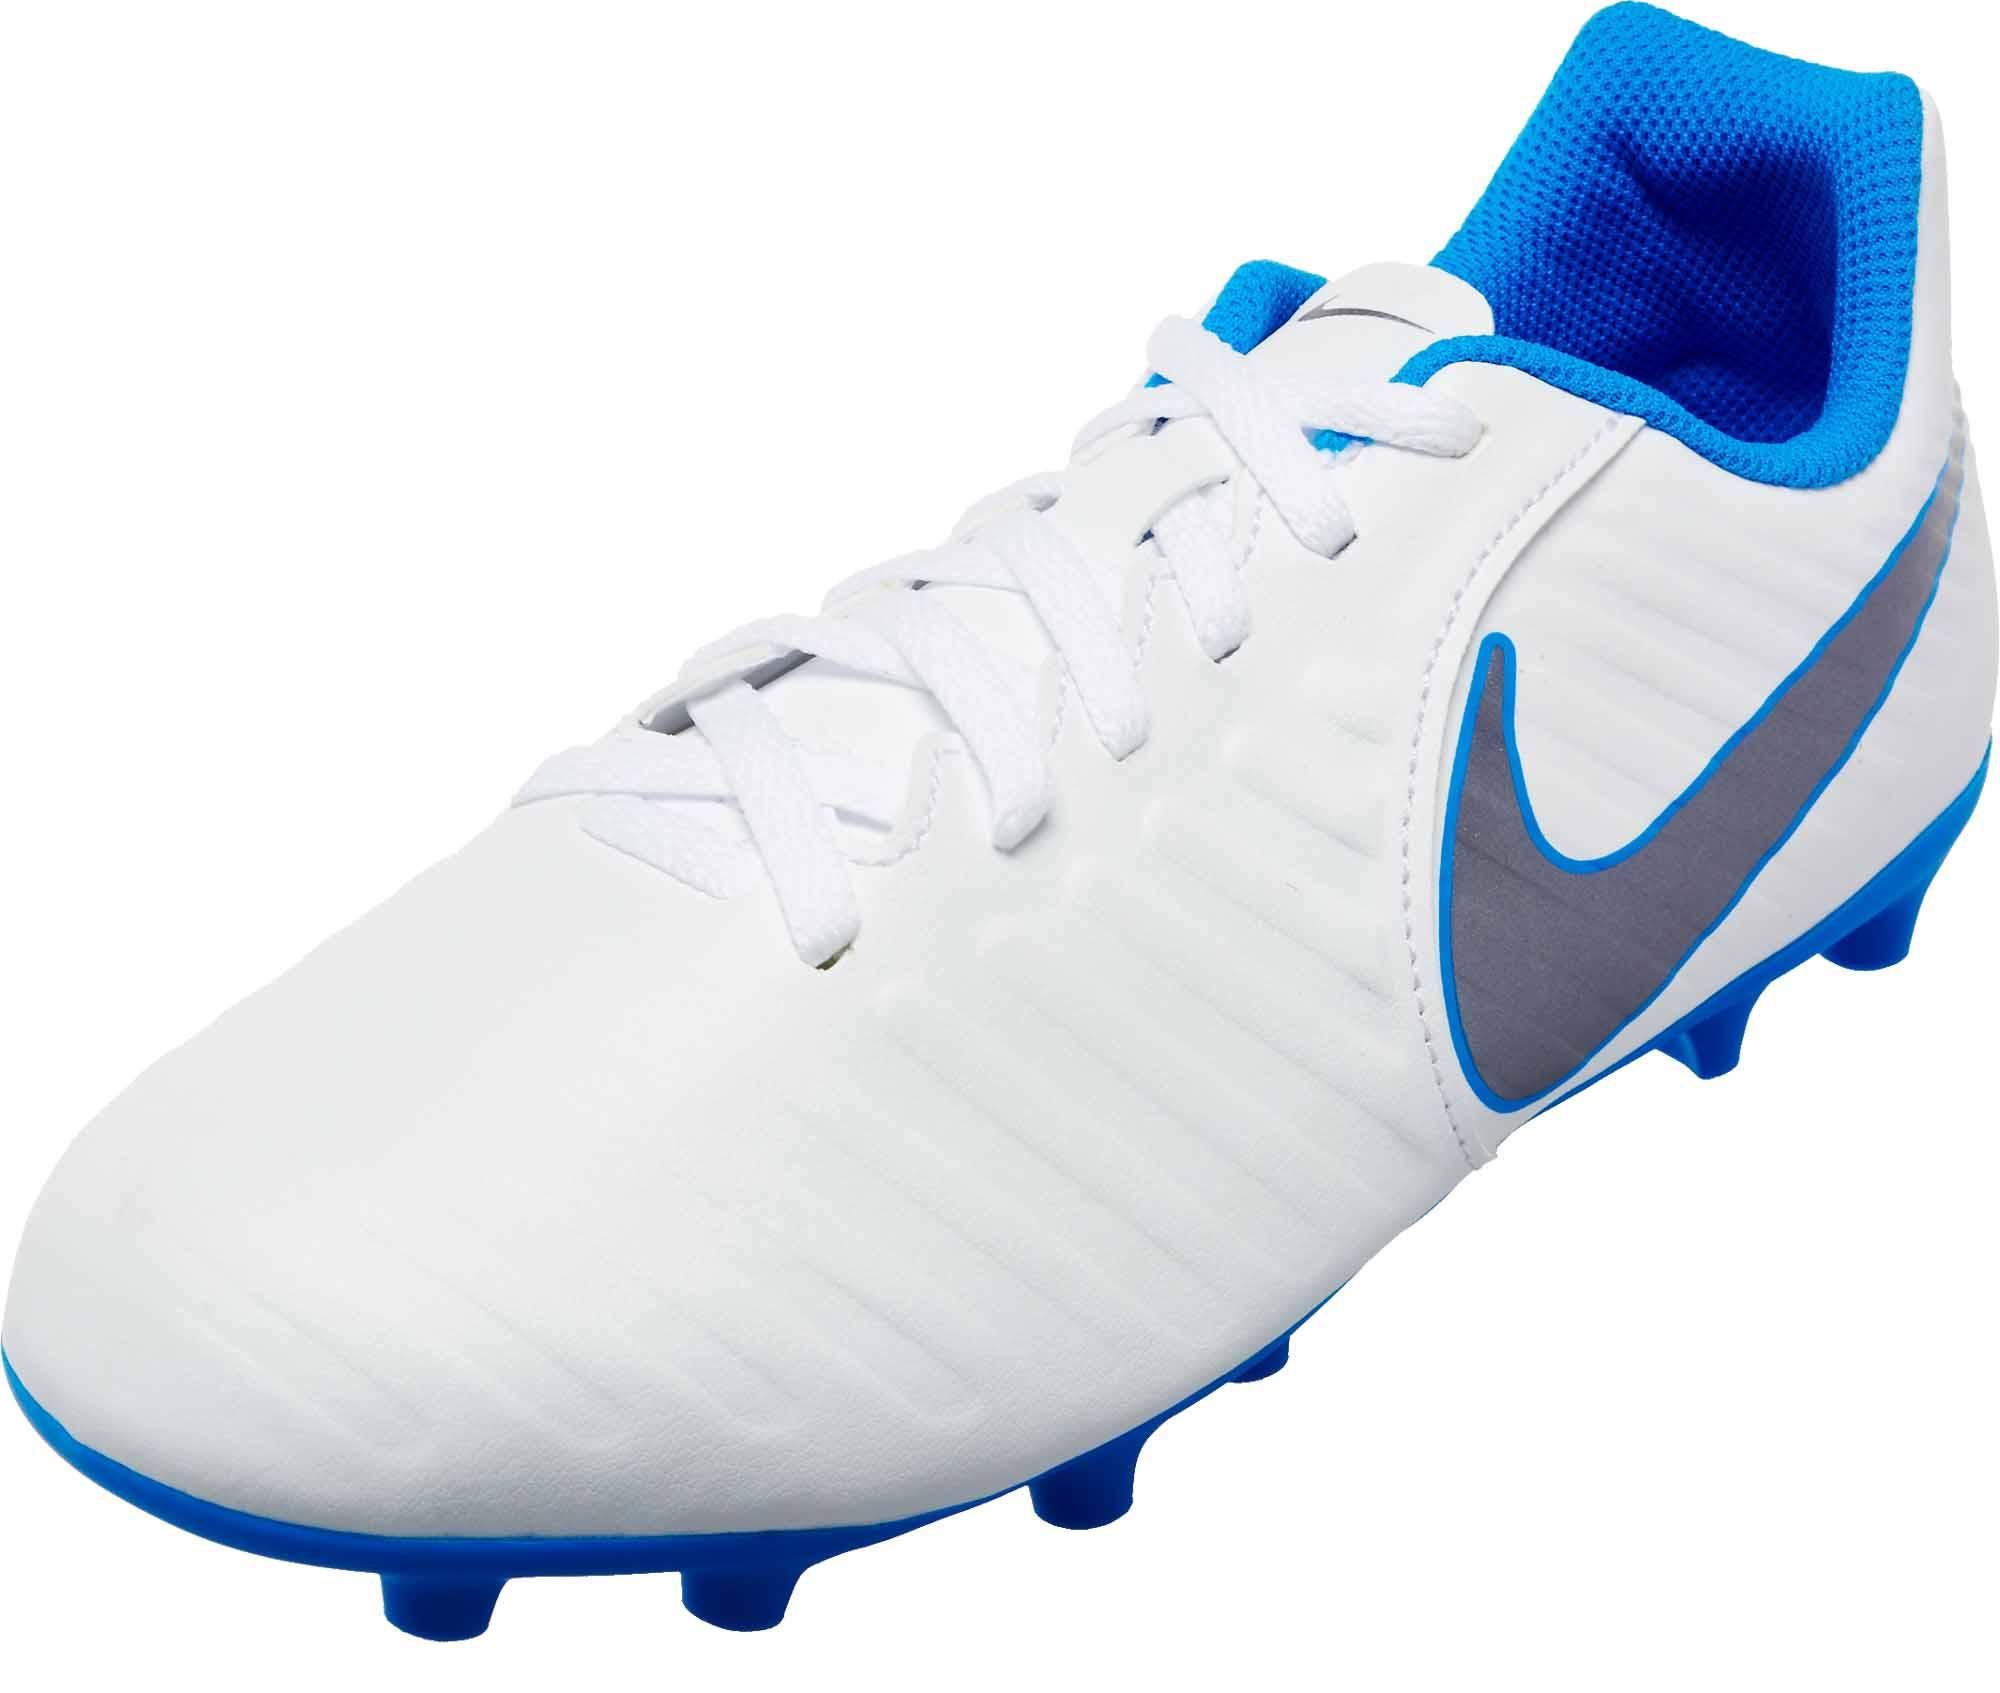 another chance ba0b8 46ffb Nike Tiempo Legend 7 Club FG - Youth - White/Metallic Cool Grey/Blue Hero